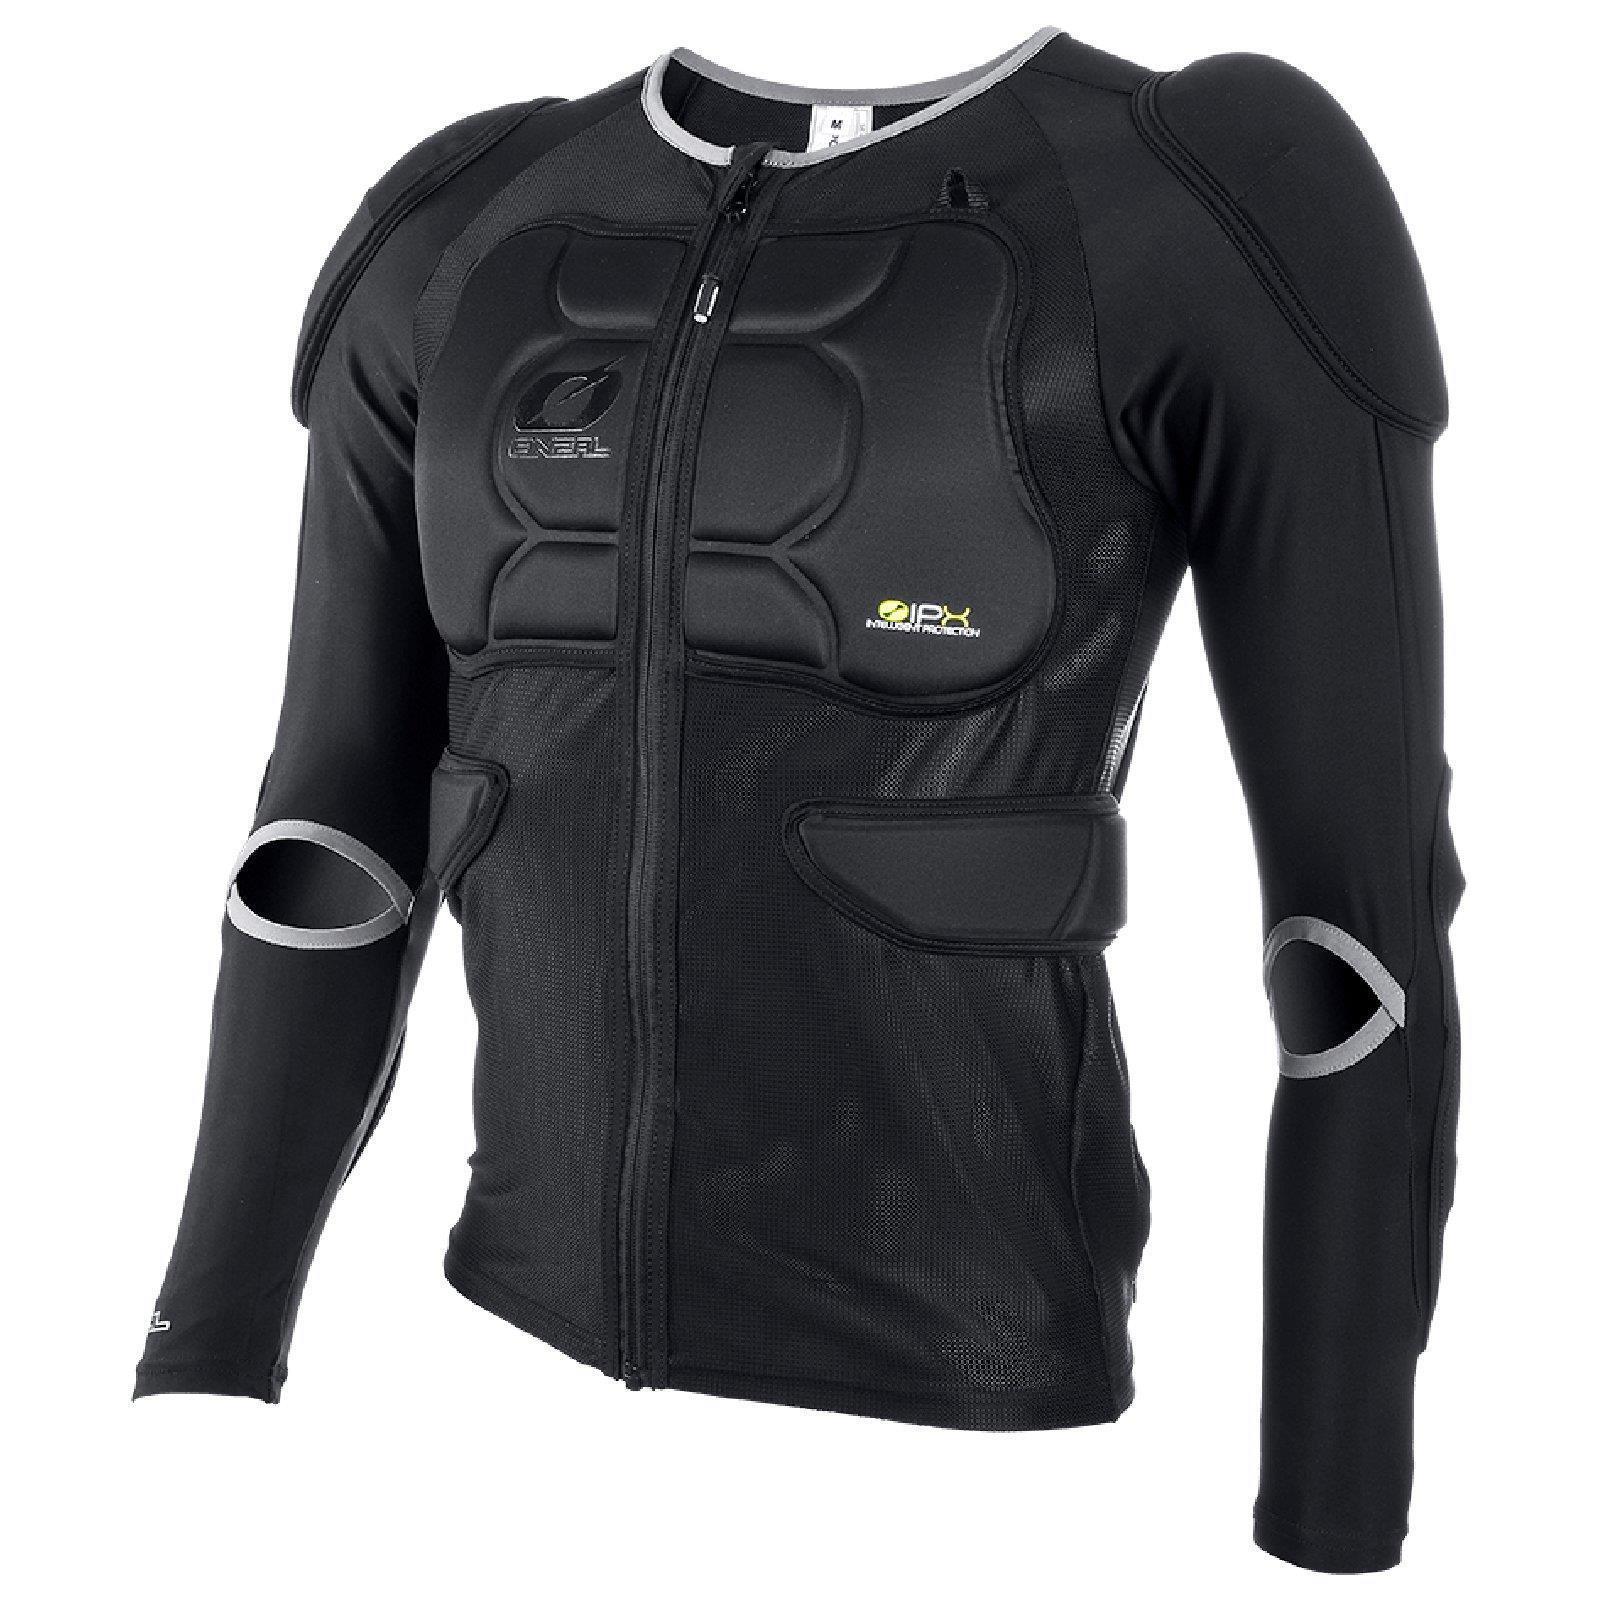 ONeal BP projoector chaqueta pecho armadura MTB DH FR chaleco Moto cross downhill MTB